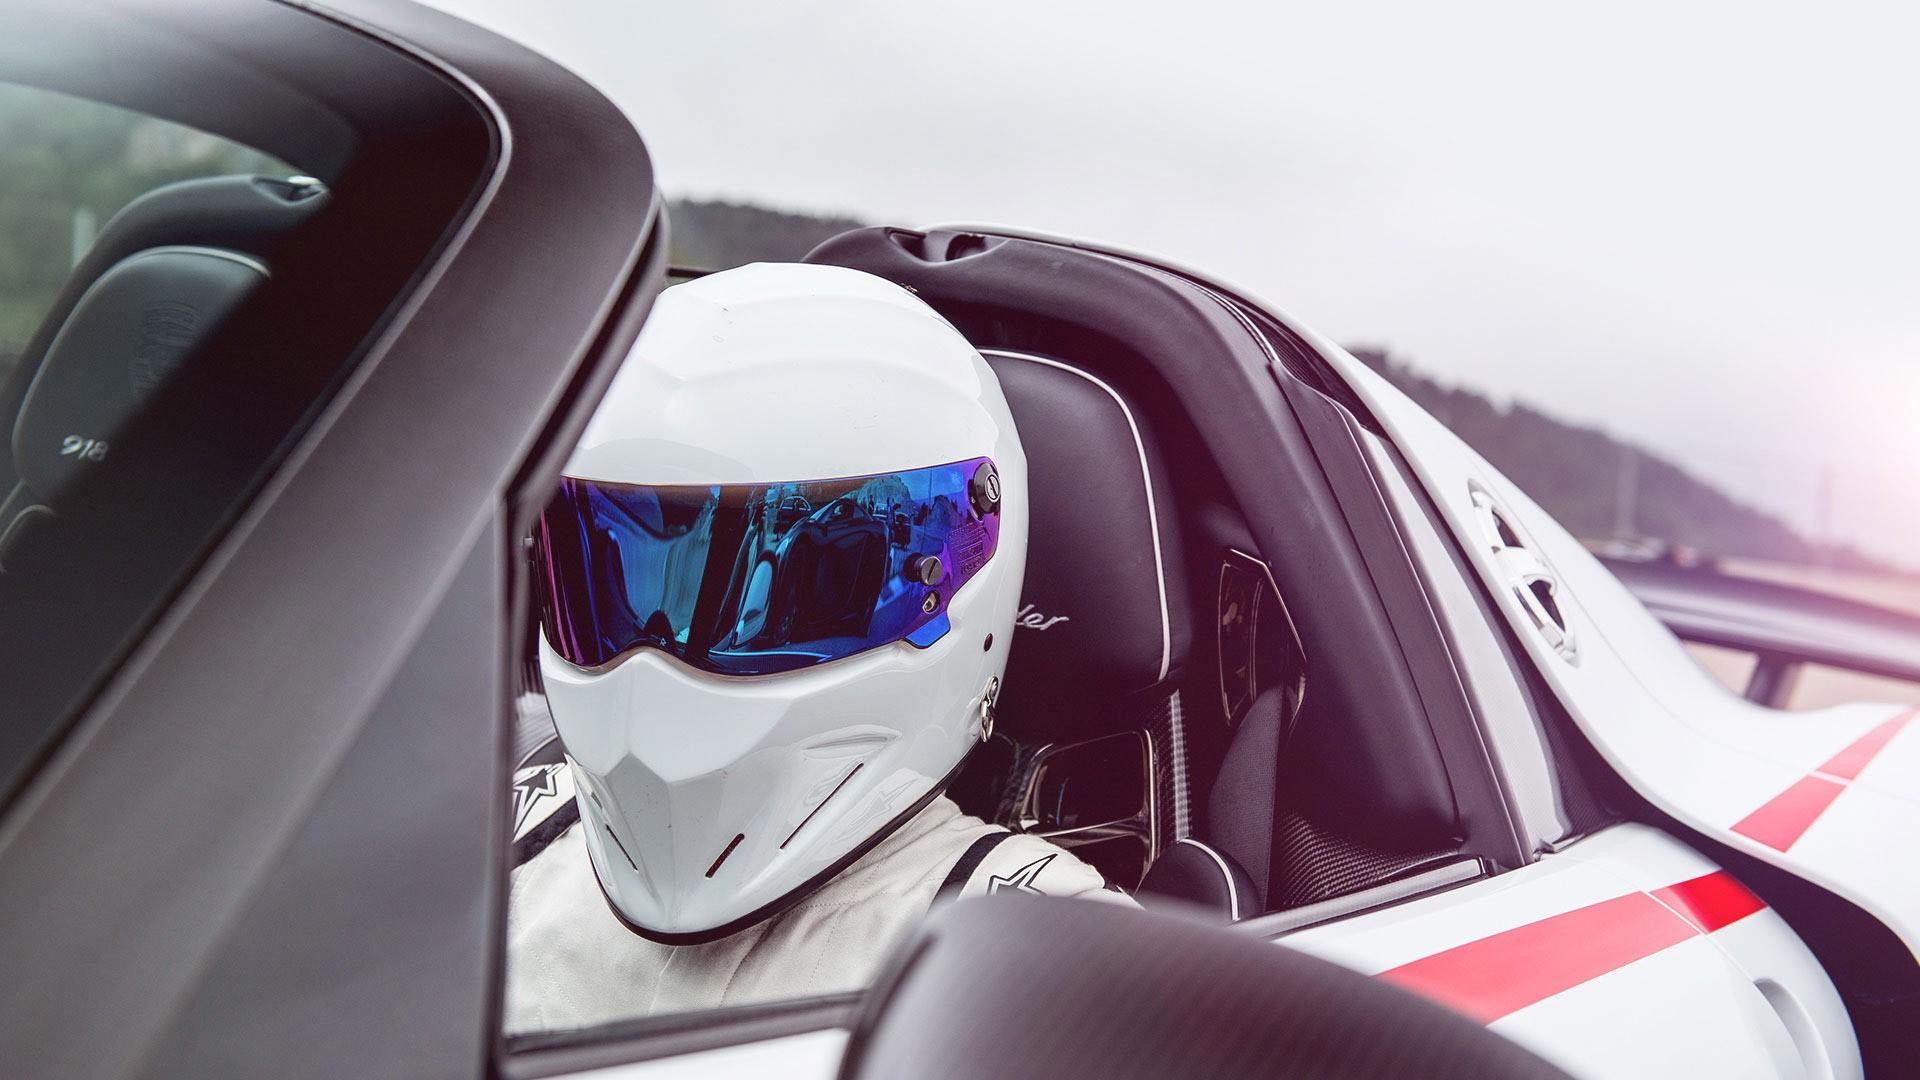 men-car-reflection-vehicle-helmet-Porsche-sports-car-driving-Porsche-918-Spyder-Top-Gear-The-Stig-supercar-land-vehicle-automotive-design-automobile-make-concept-car-157845 Interesting Hinh Anh Xe Porsche 918 Spyder Cars Trend